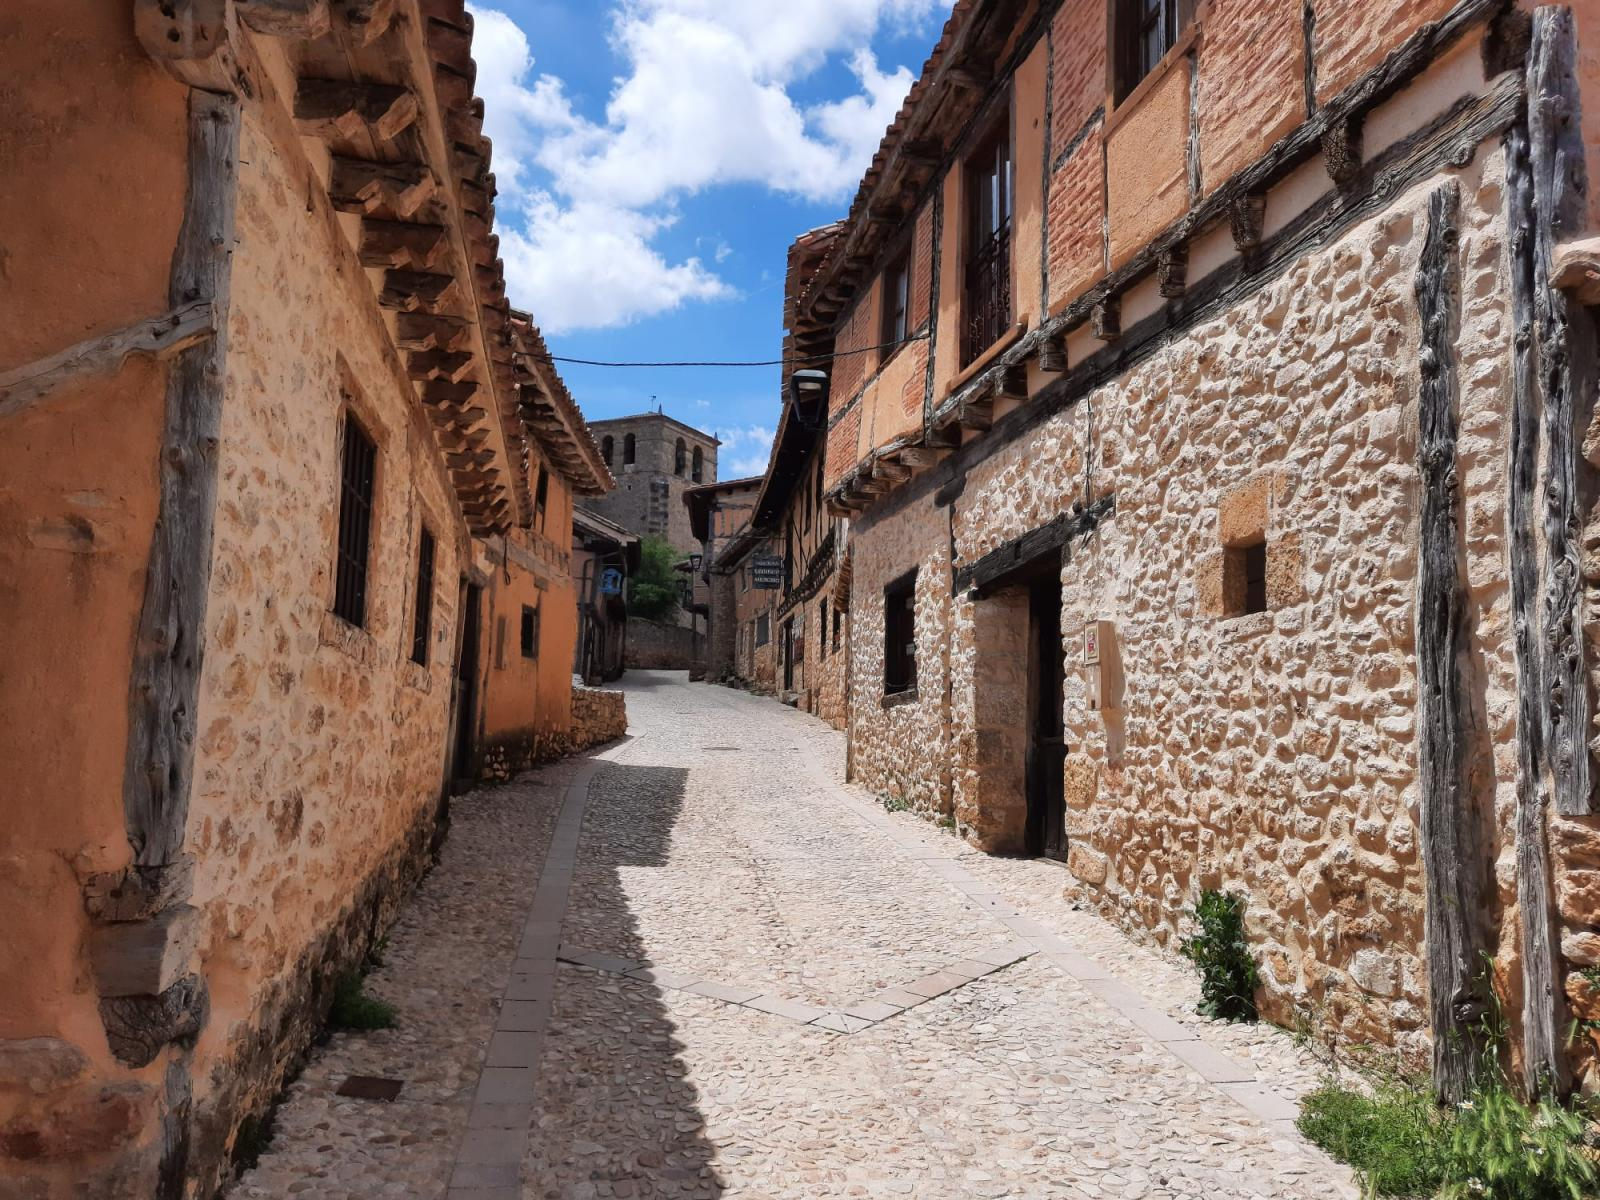 Visita Guiada-Calatañazor (Encanto medieval)